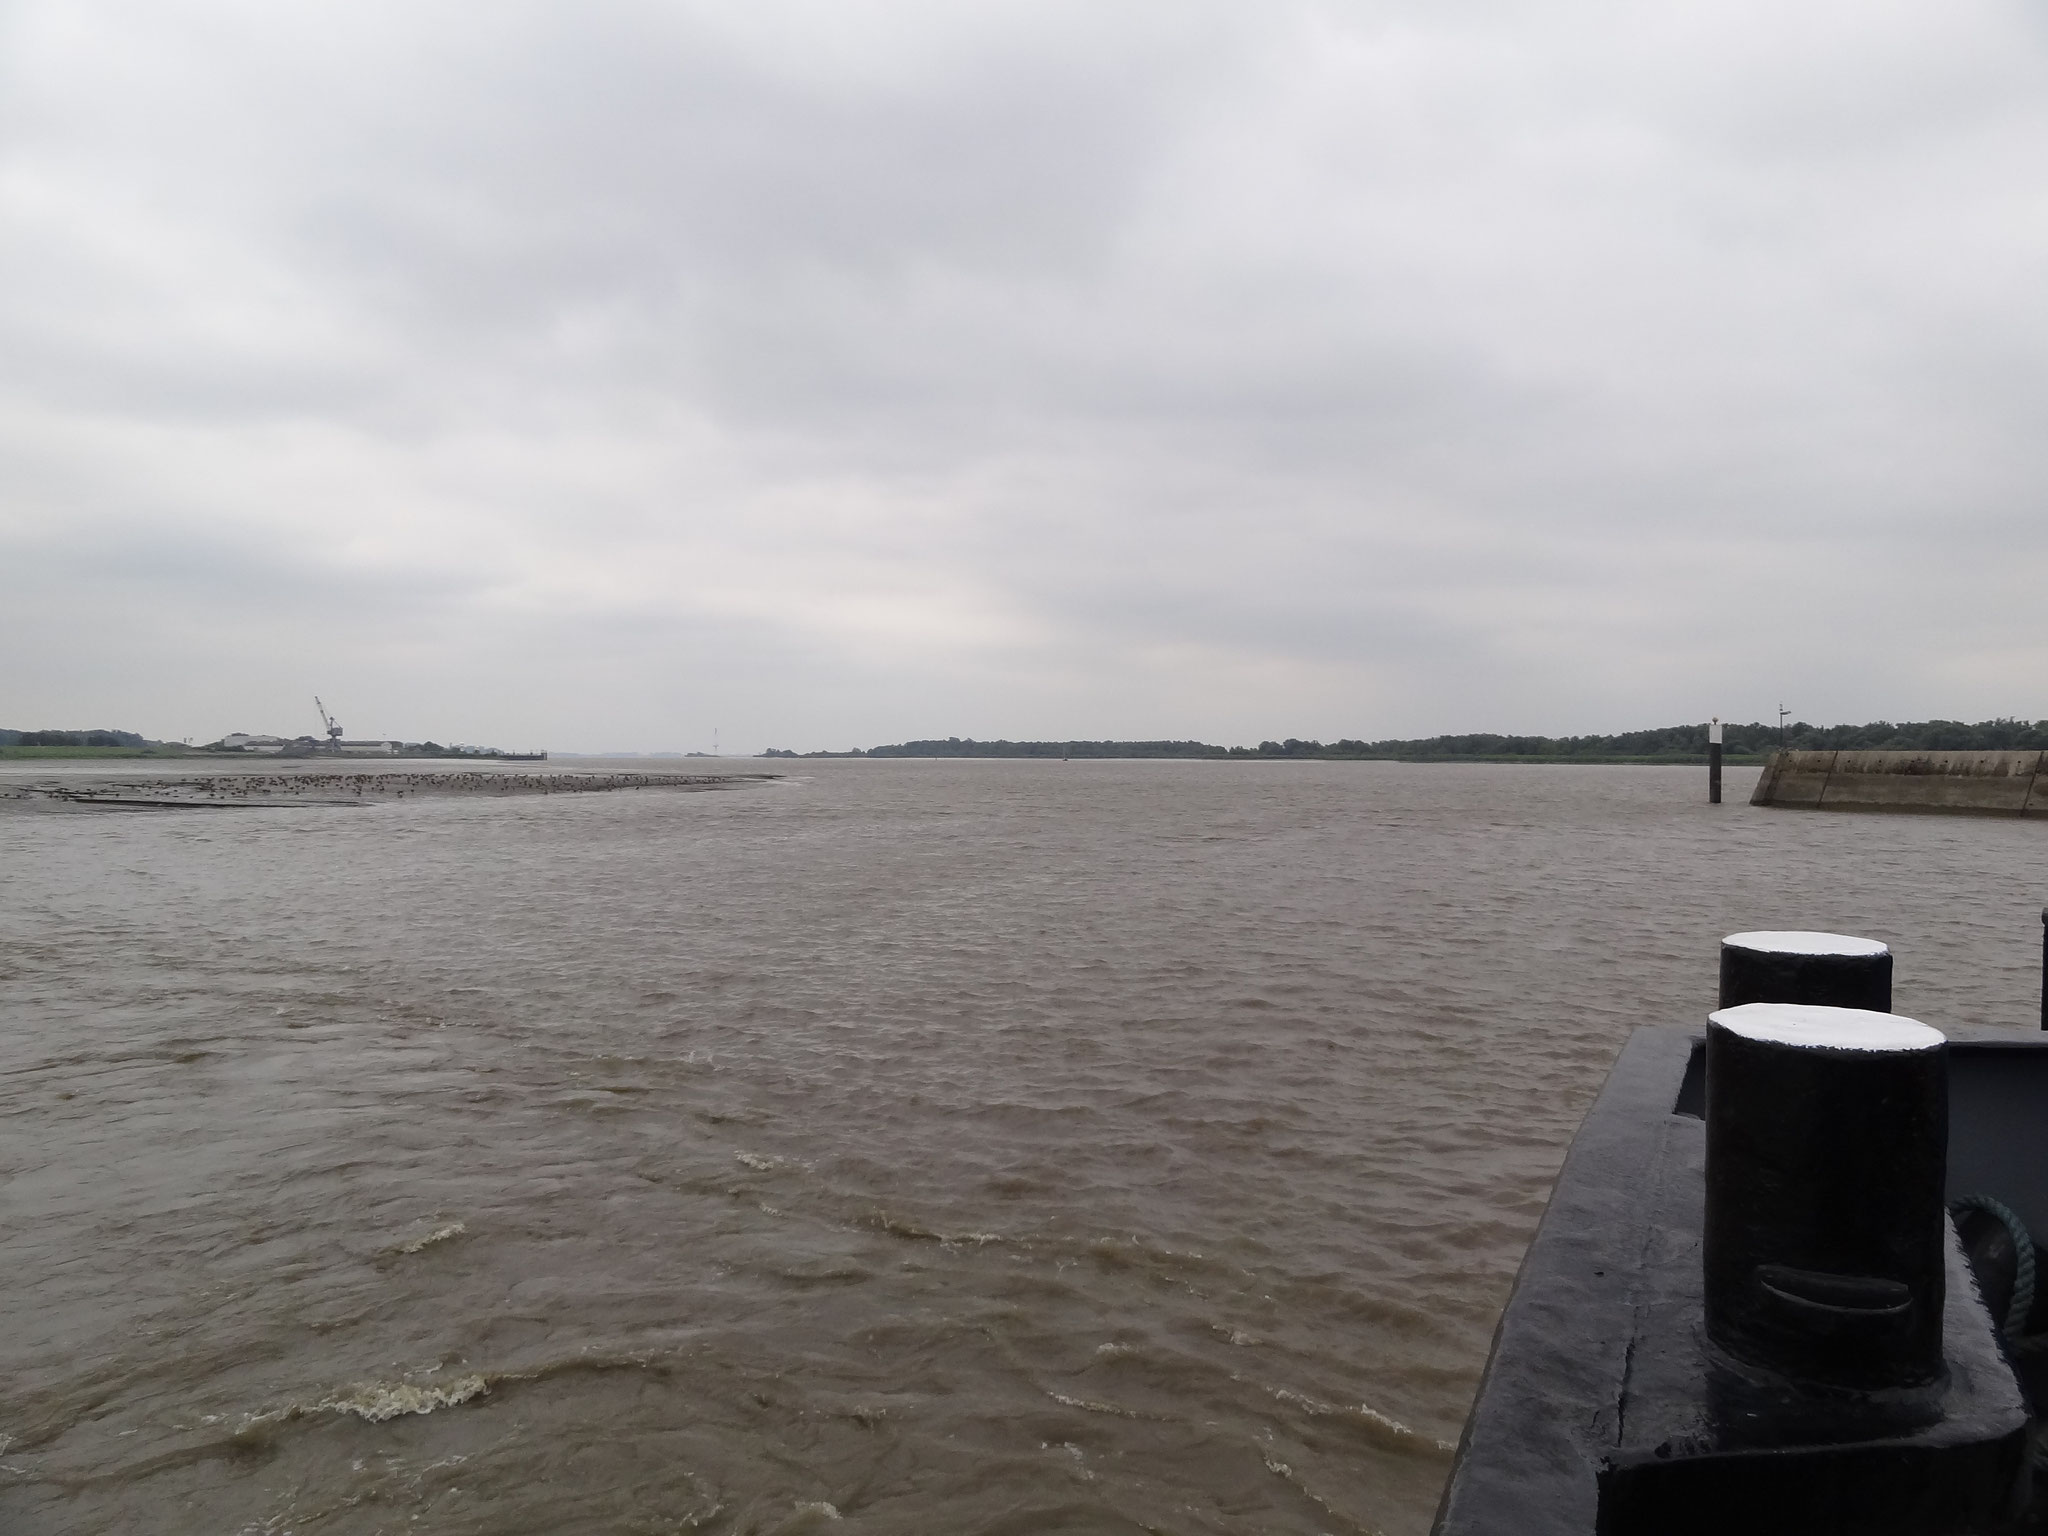 Elbe in Wischhafen